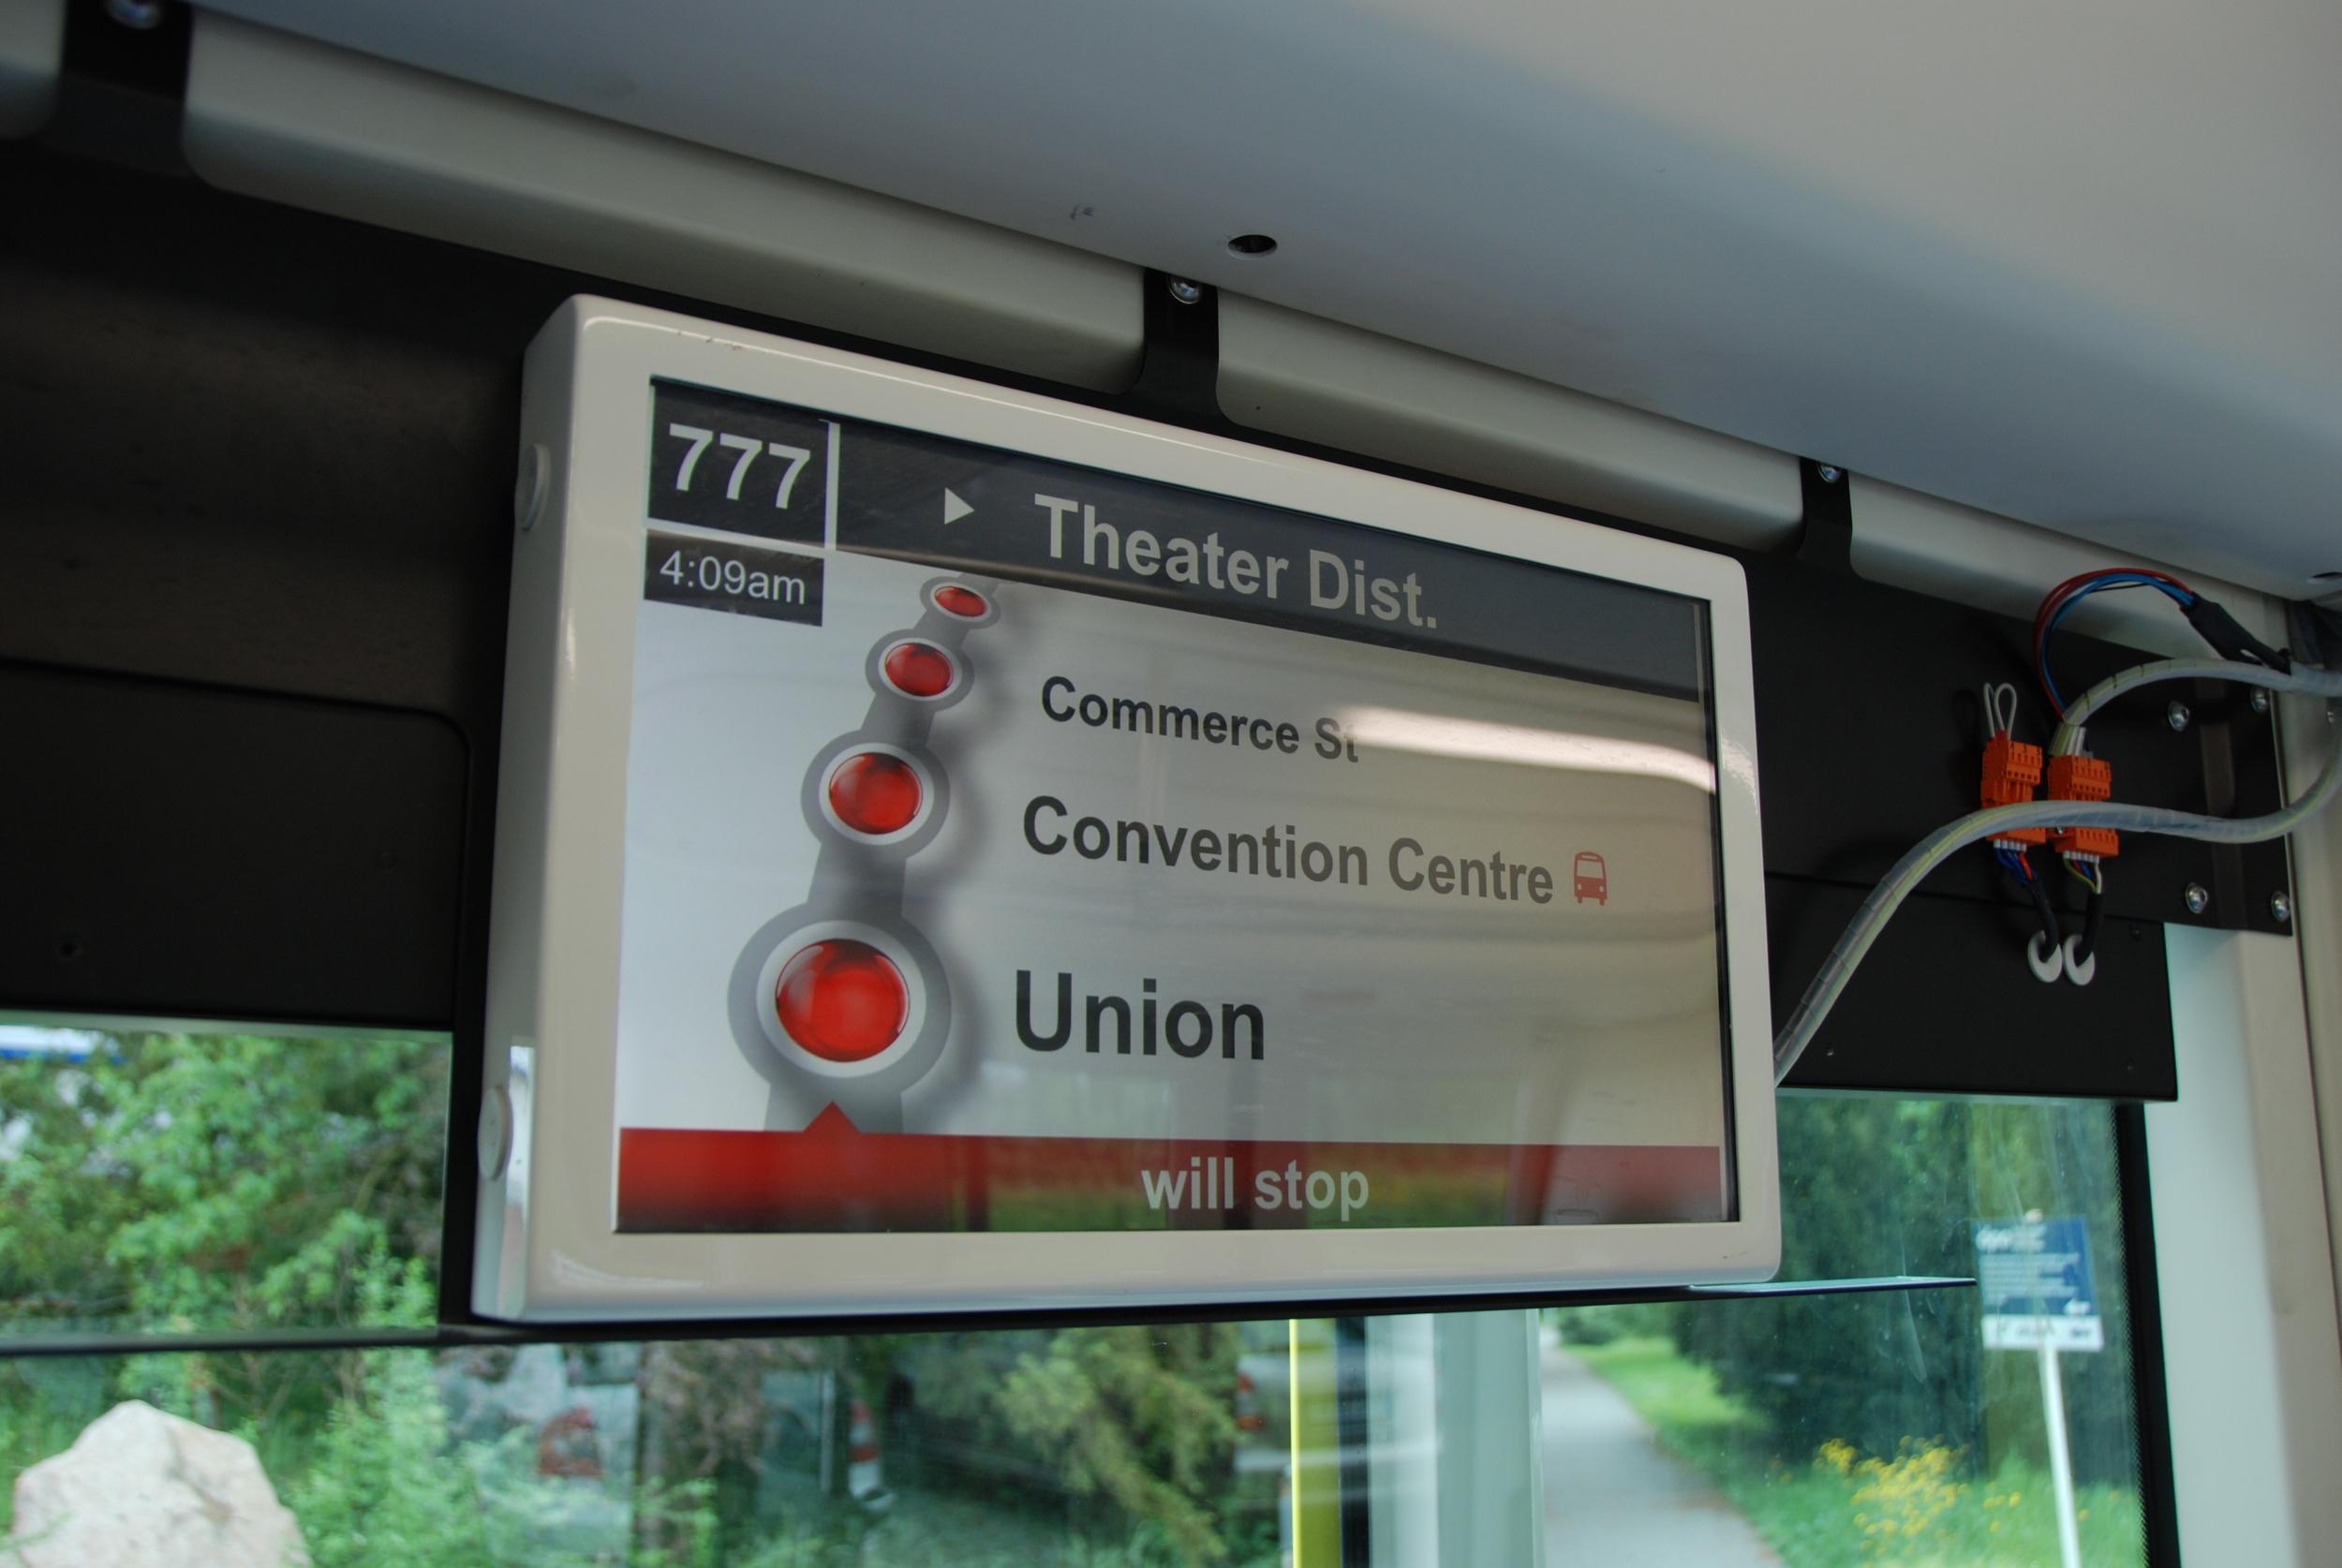 Ukázka informačního systému ve vozidle Inekon Trio 121. (foto: Libor Hinčica)